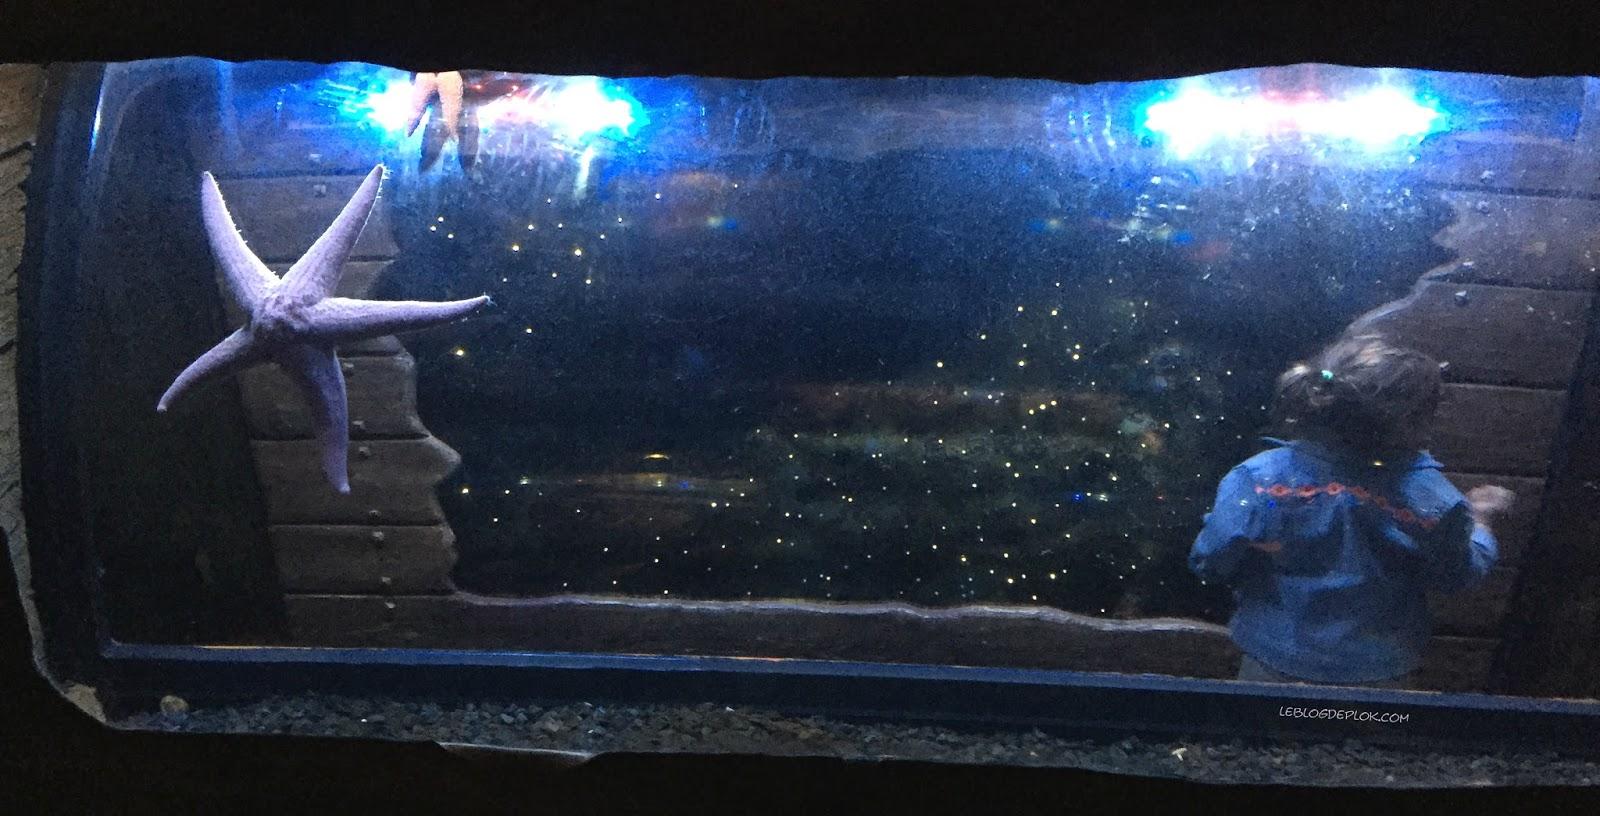 le blog de plok aquarium des stars l 39 affiche de l. Black Bedroom Furniture Sets. Home Design Ideas